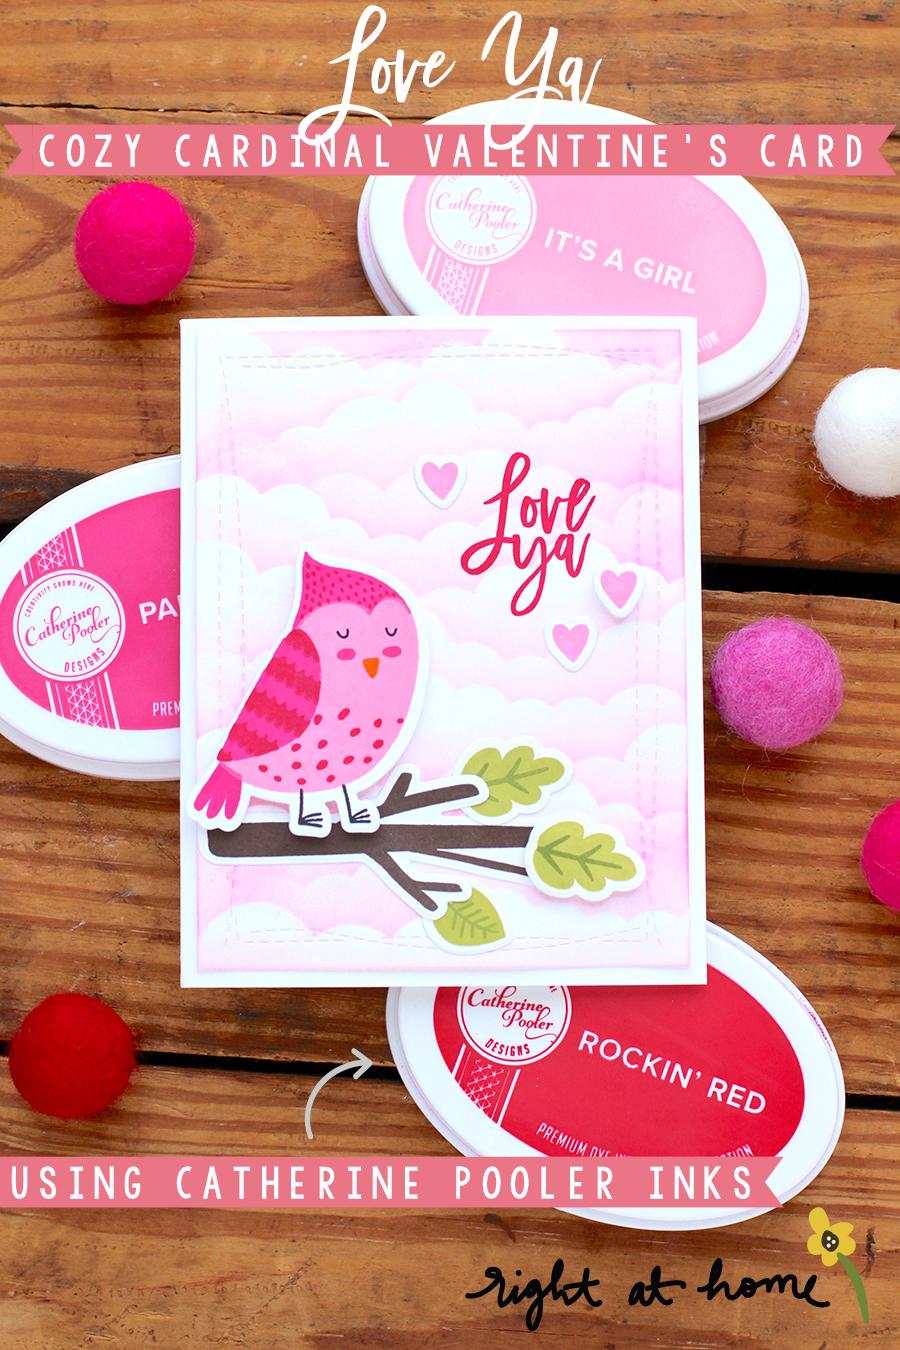 Love Ya Cozy Cardinal Valentine's Day Card Using Catherine Pooler Designs Dye Inks // rightathomeshop.com/blog